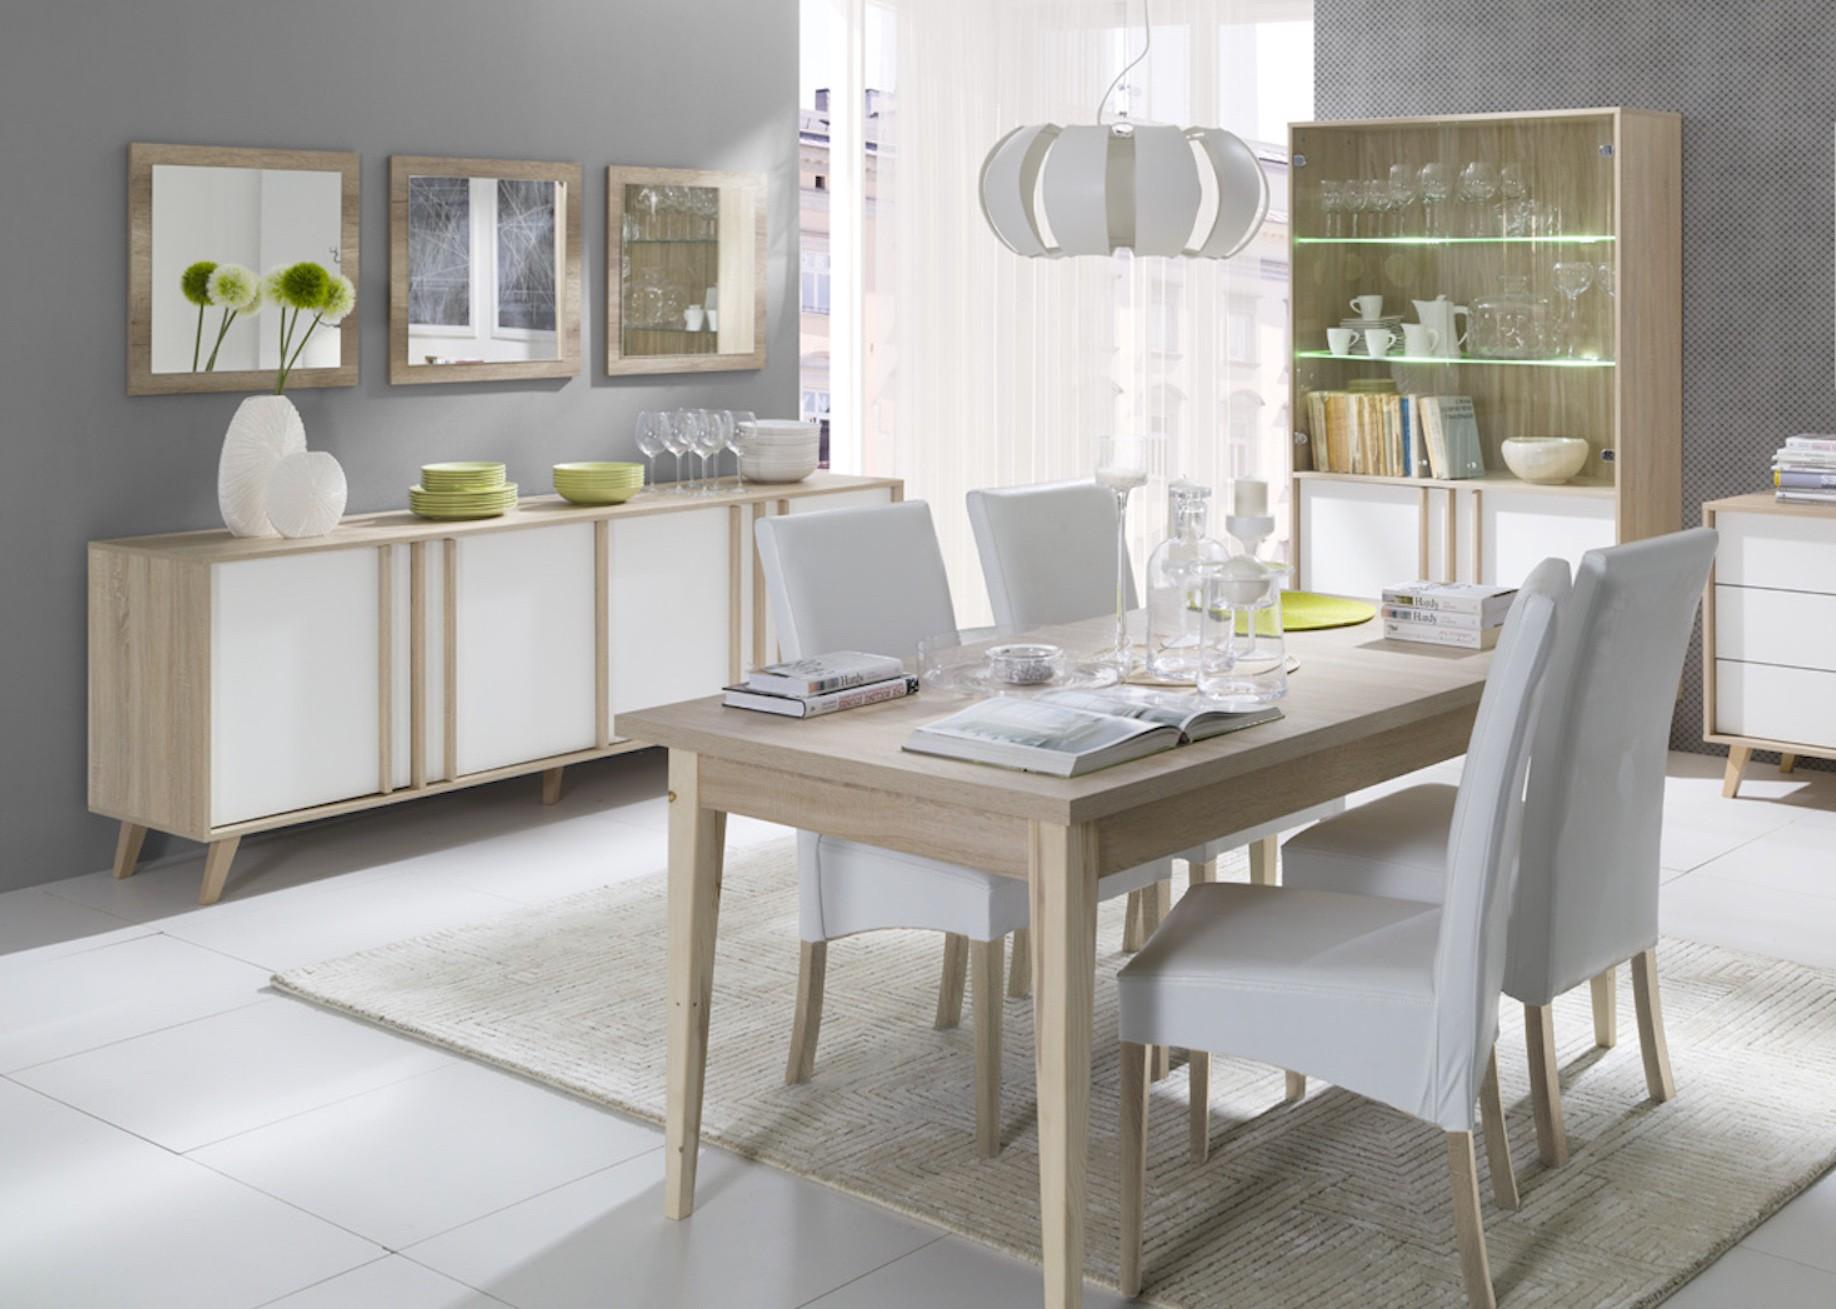 salle manger vitrine vaisselier argentier malmo grand mod le. Black Bedroom Furniture Sets. Home Design Ideas